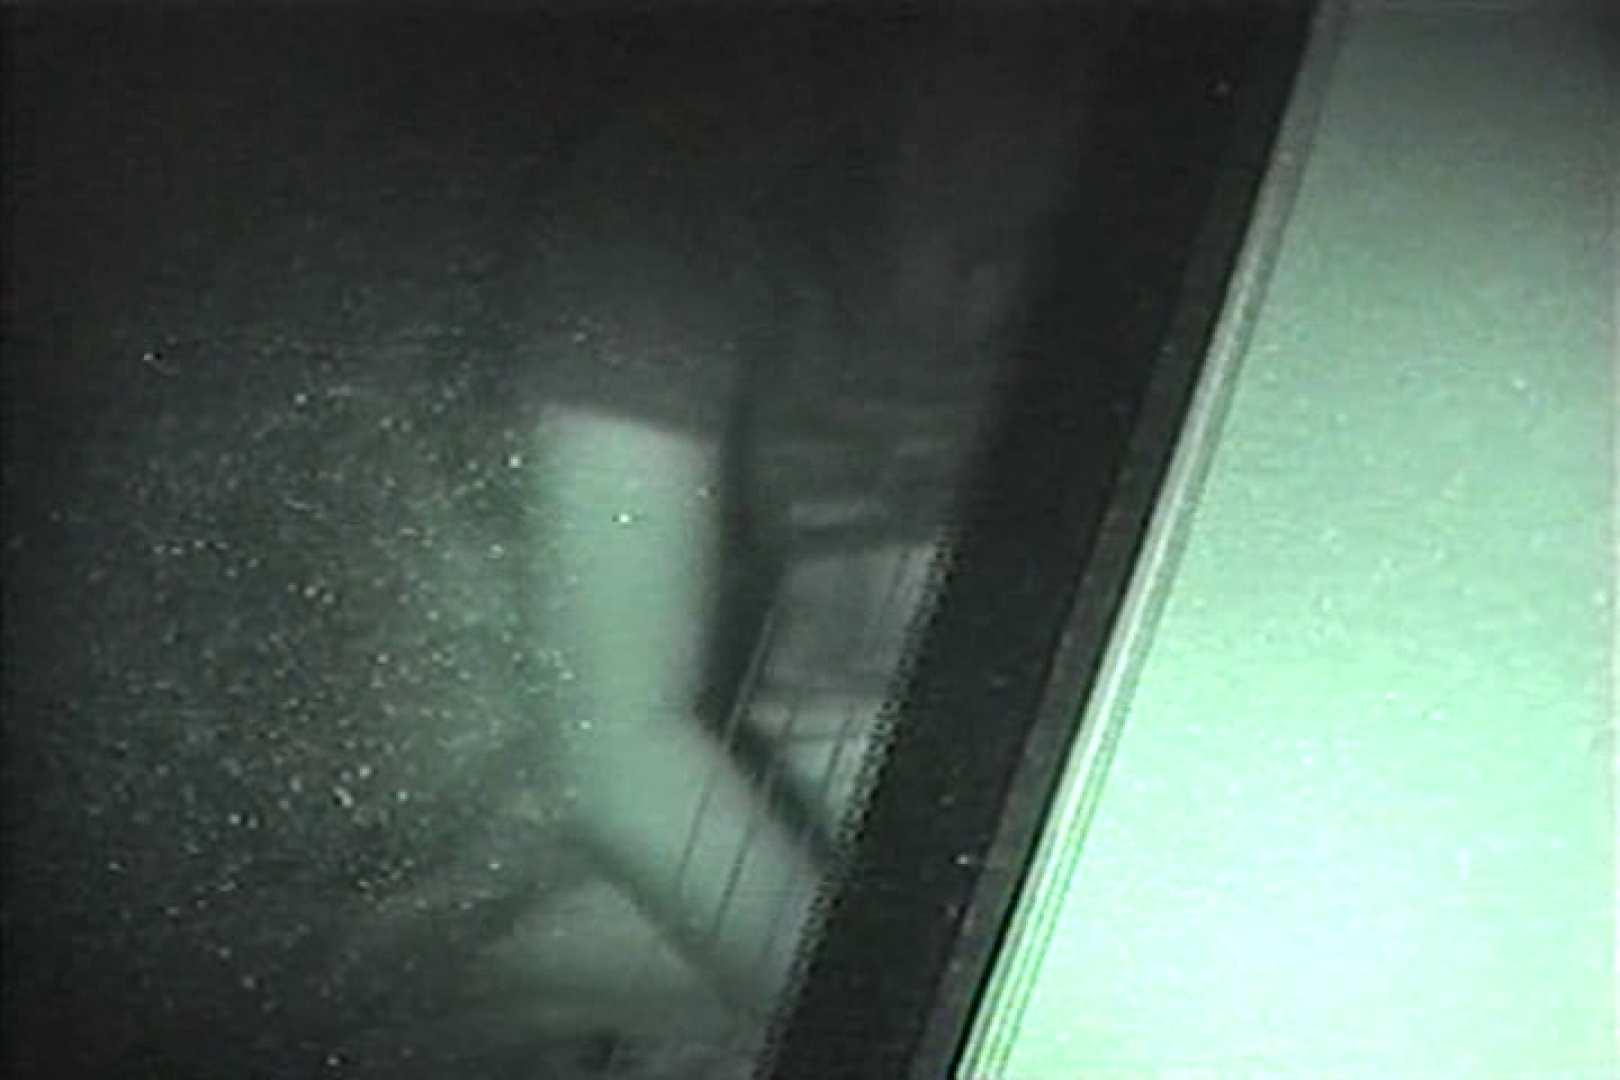 MASAさんの待ち伏せ撮り! 赤外線カーセックスVol.11 喘ぎ 覗きおまんこ画像 81画像 16